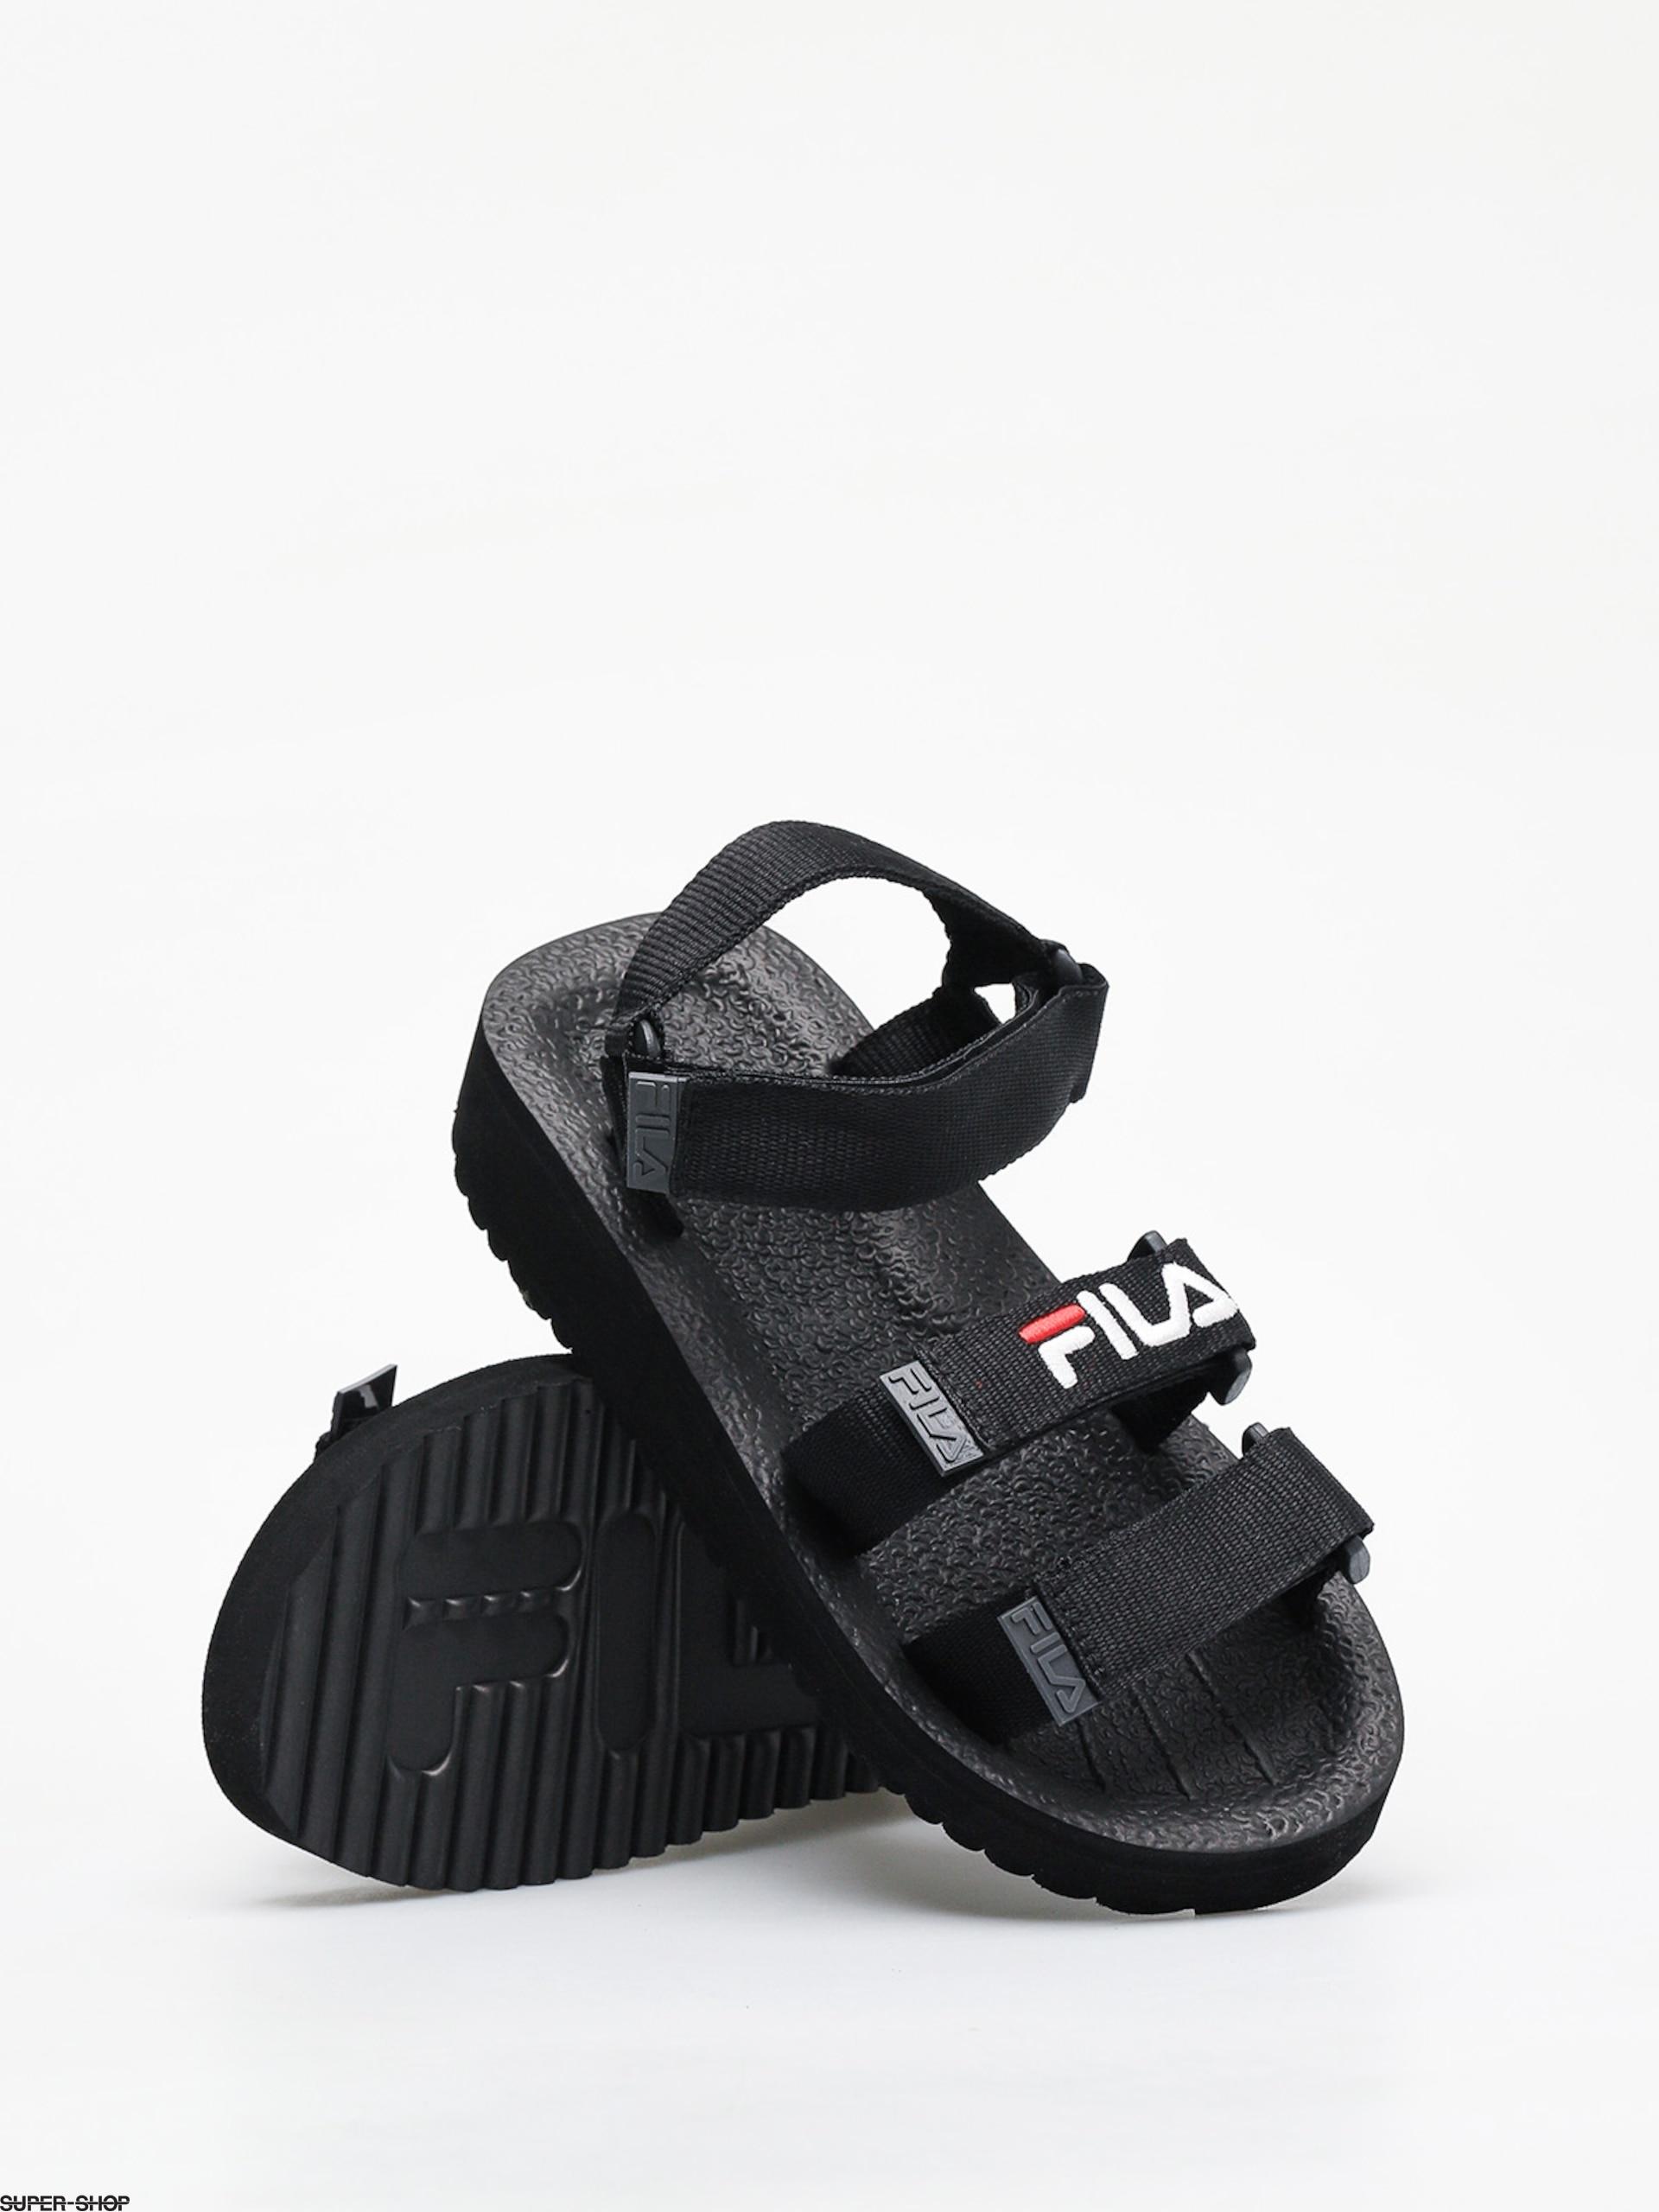 Sandal Sandals Fila Sandals Sandal Fila Fila Wmnblack Tomaia Tomaia Tomaia Sandal Wmnblack qSMVUzpG